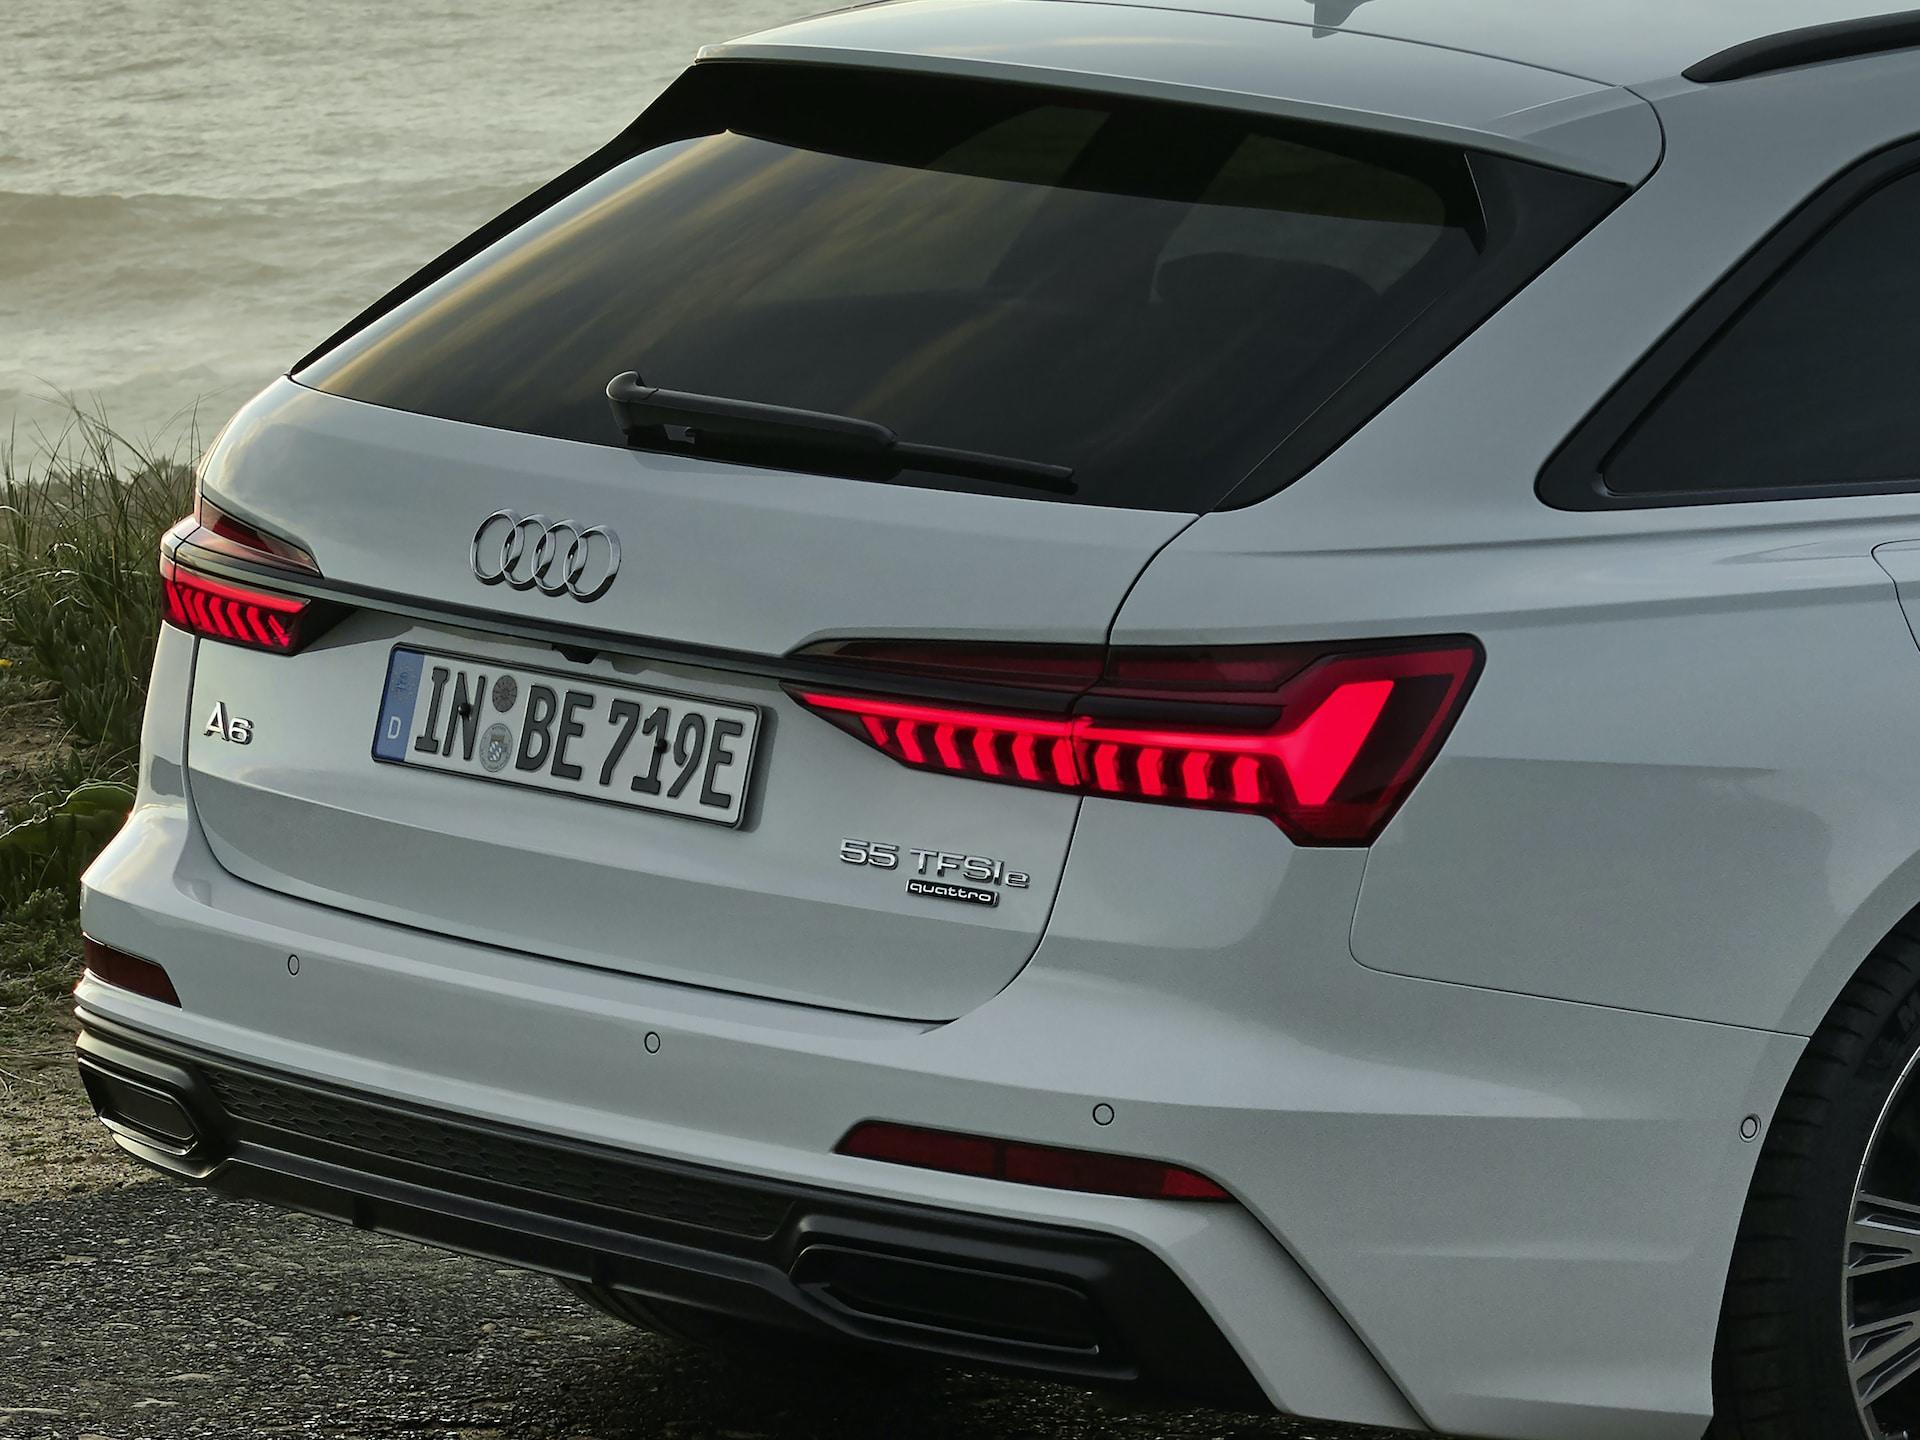 Audi Bietet A6 Kombi Nun Auch Als Plug In Hybrid An Elektroauto News Net